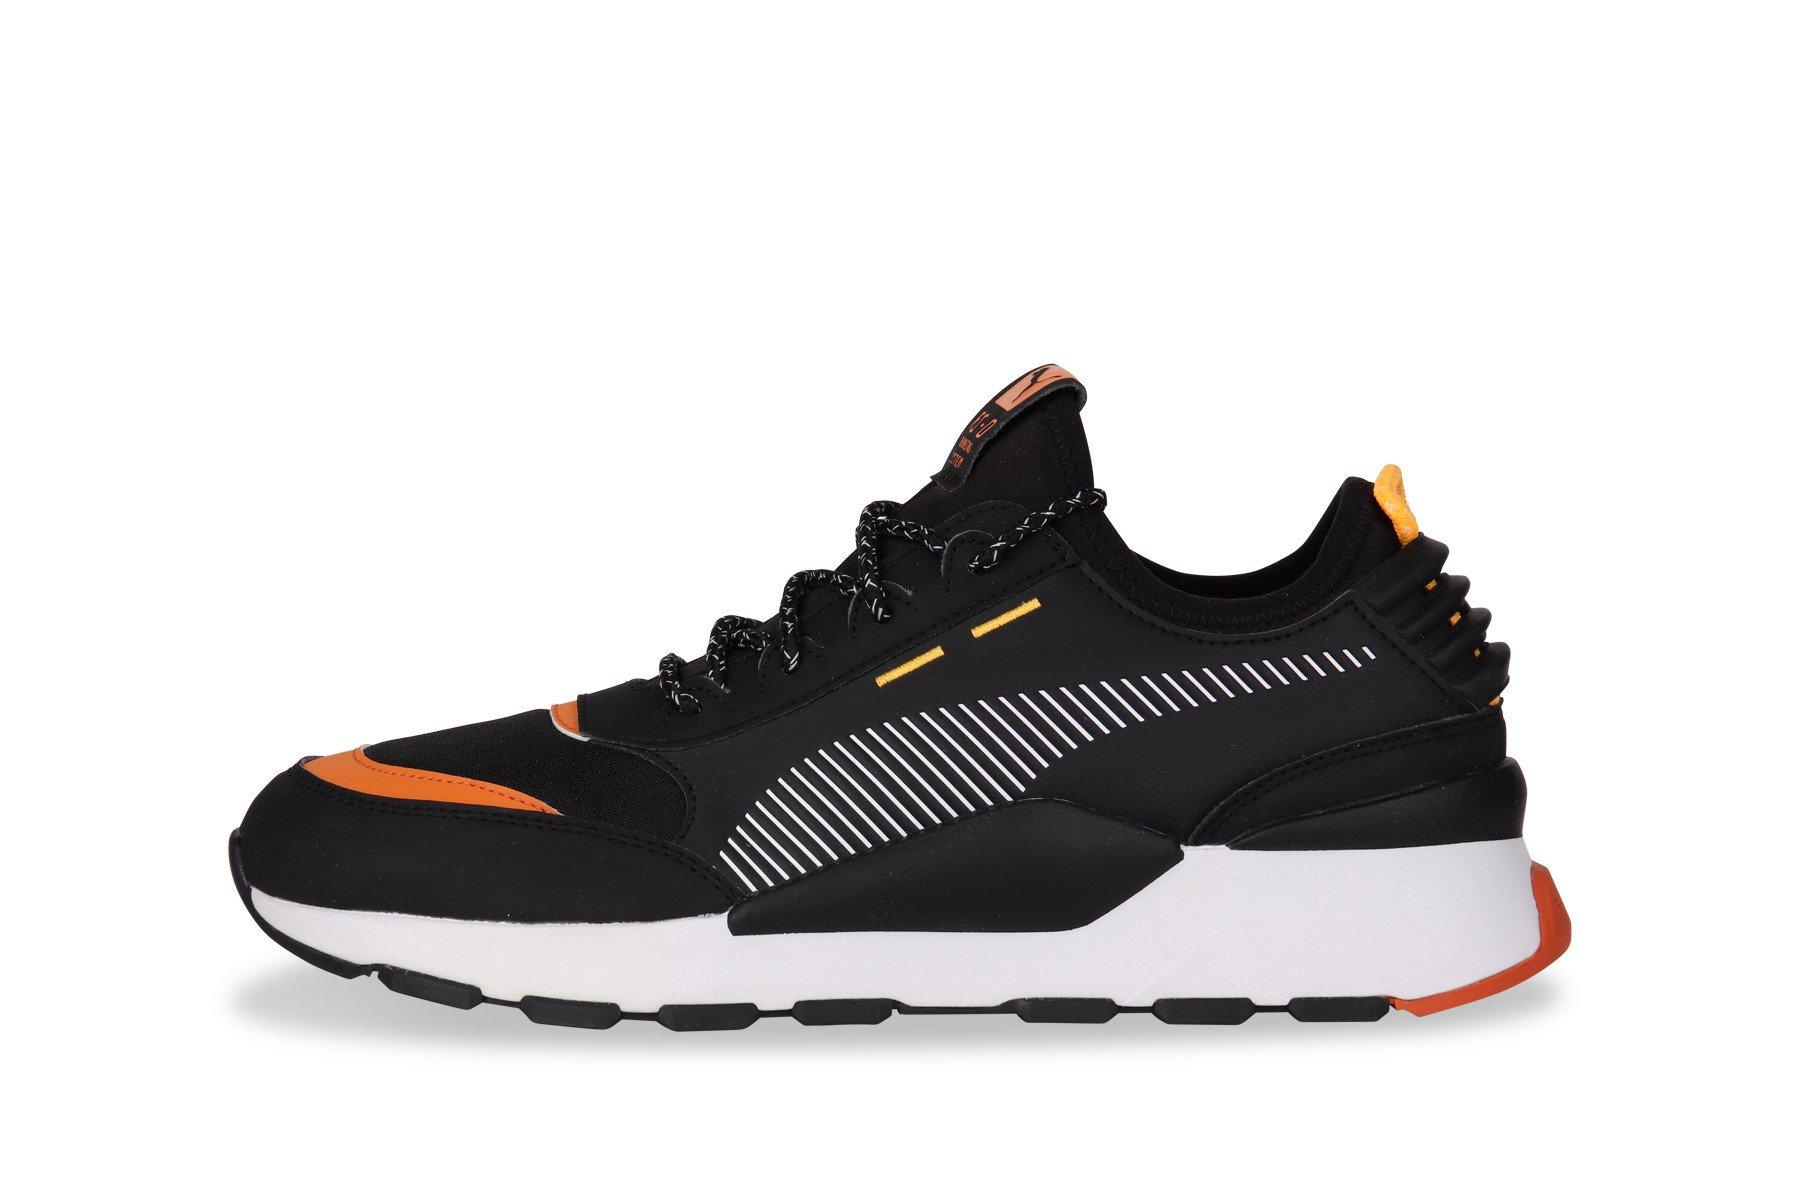 Puma - RS-0-Trail Black/Orange Alert